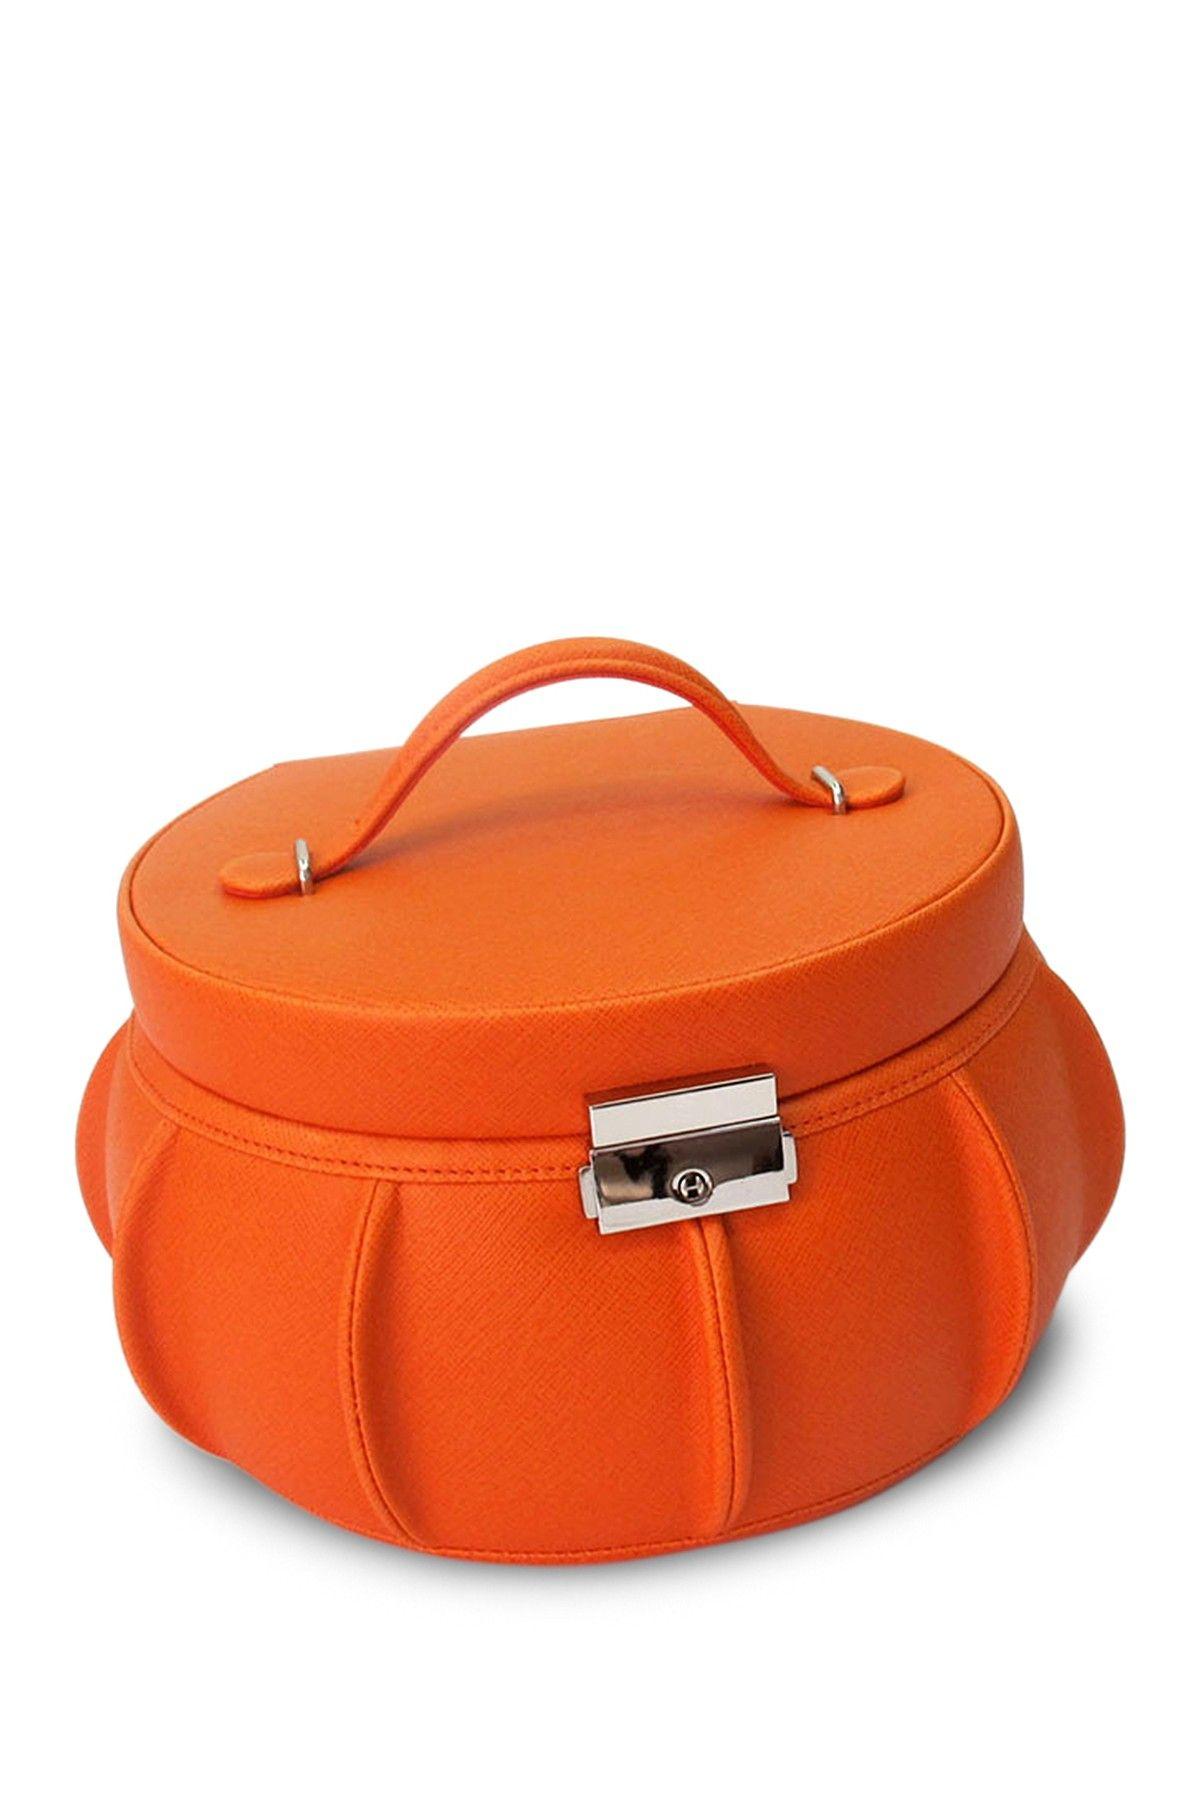 Allison Leather Orange Jewelry Box on @HauteLook